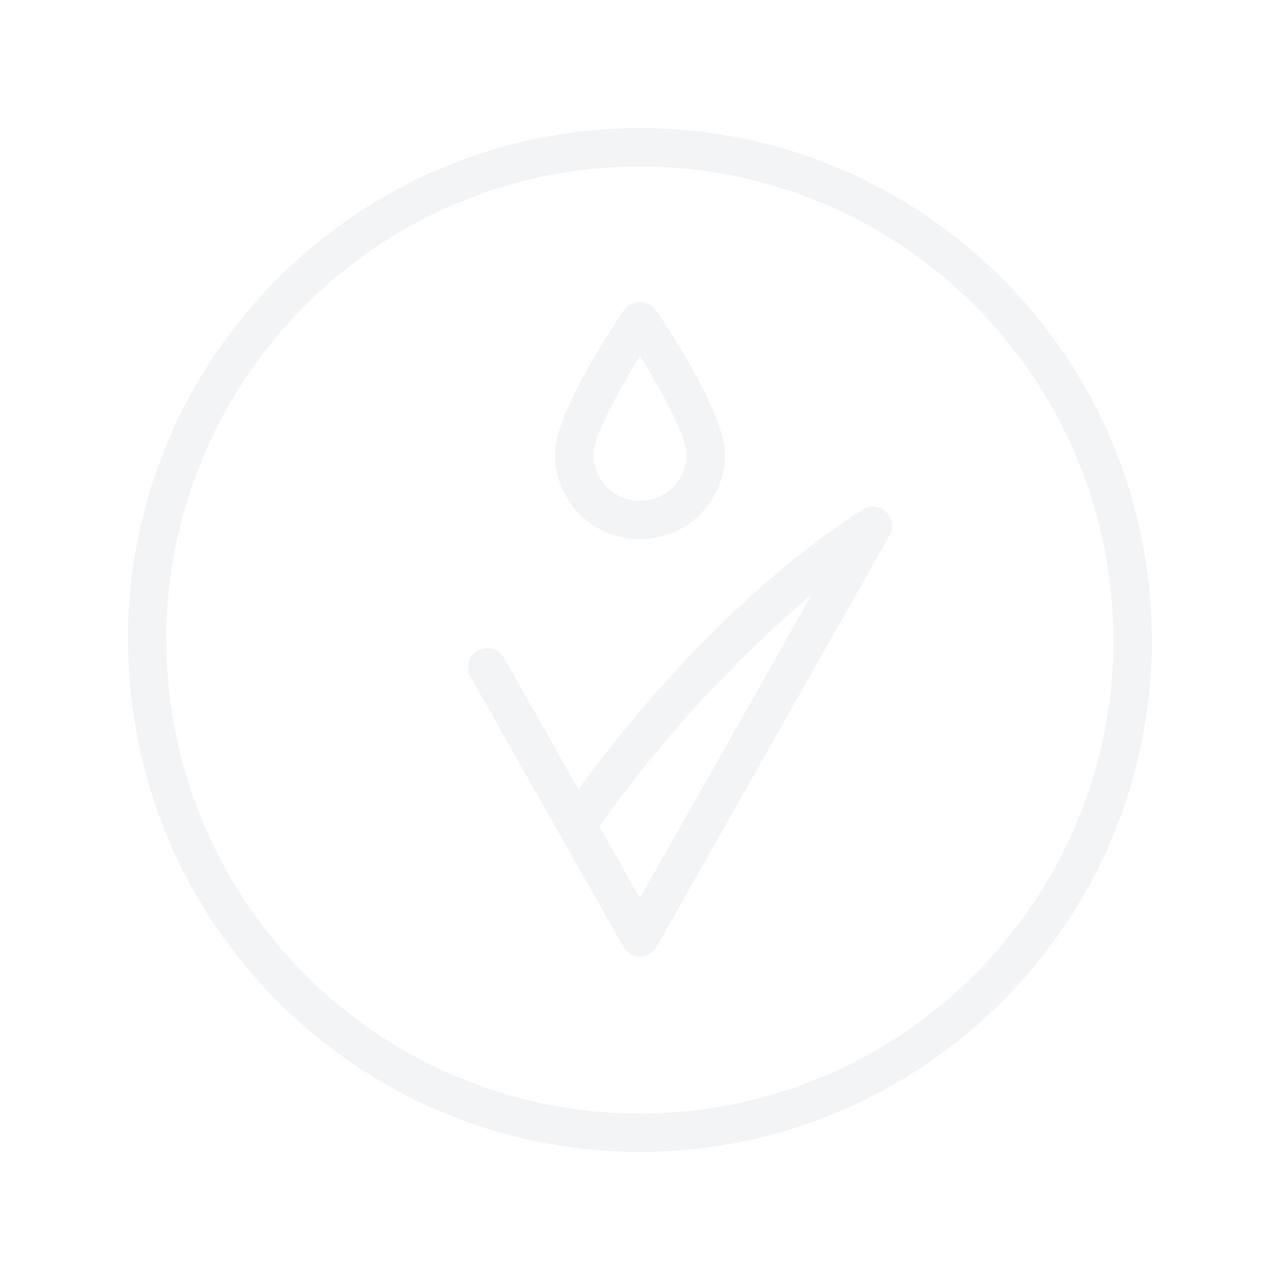 SESDERMA Retises 0.25 Anti-Wrinkle Regenerative Cream 30ml